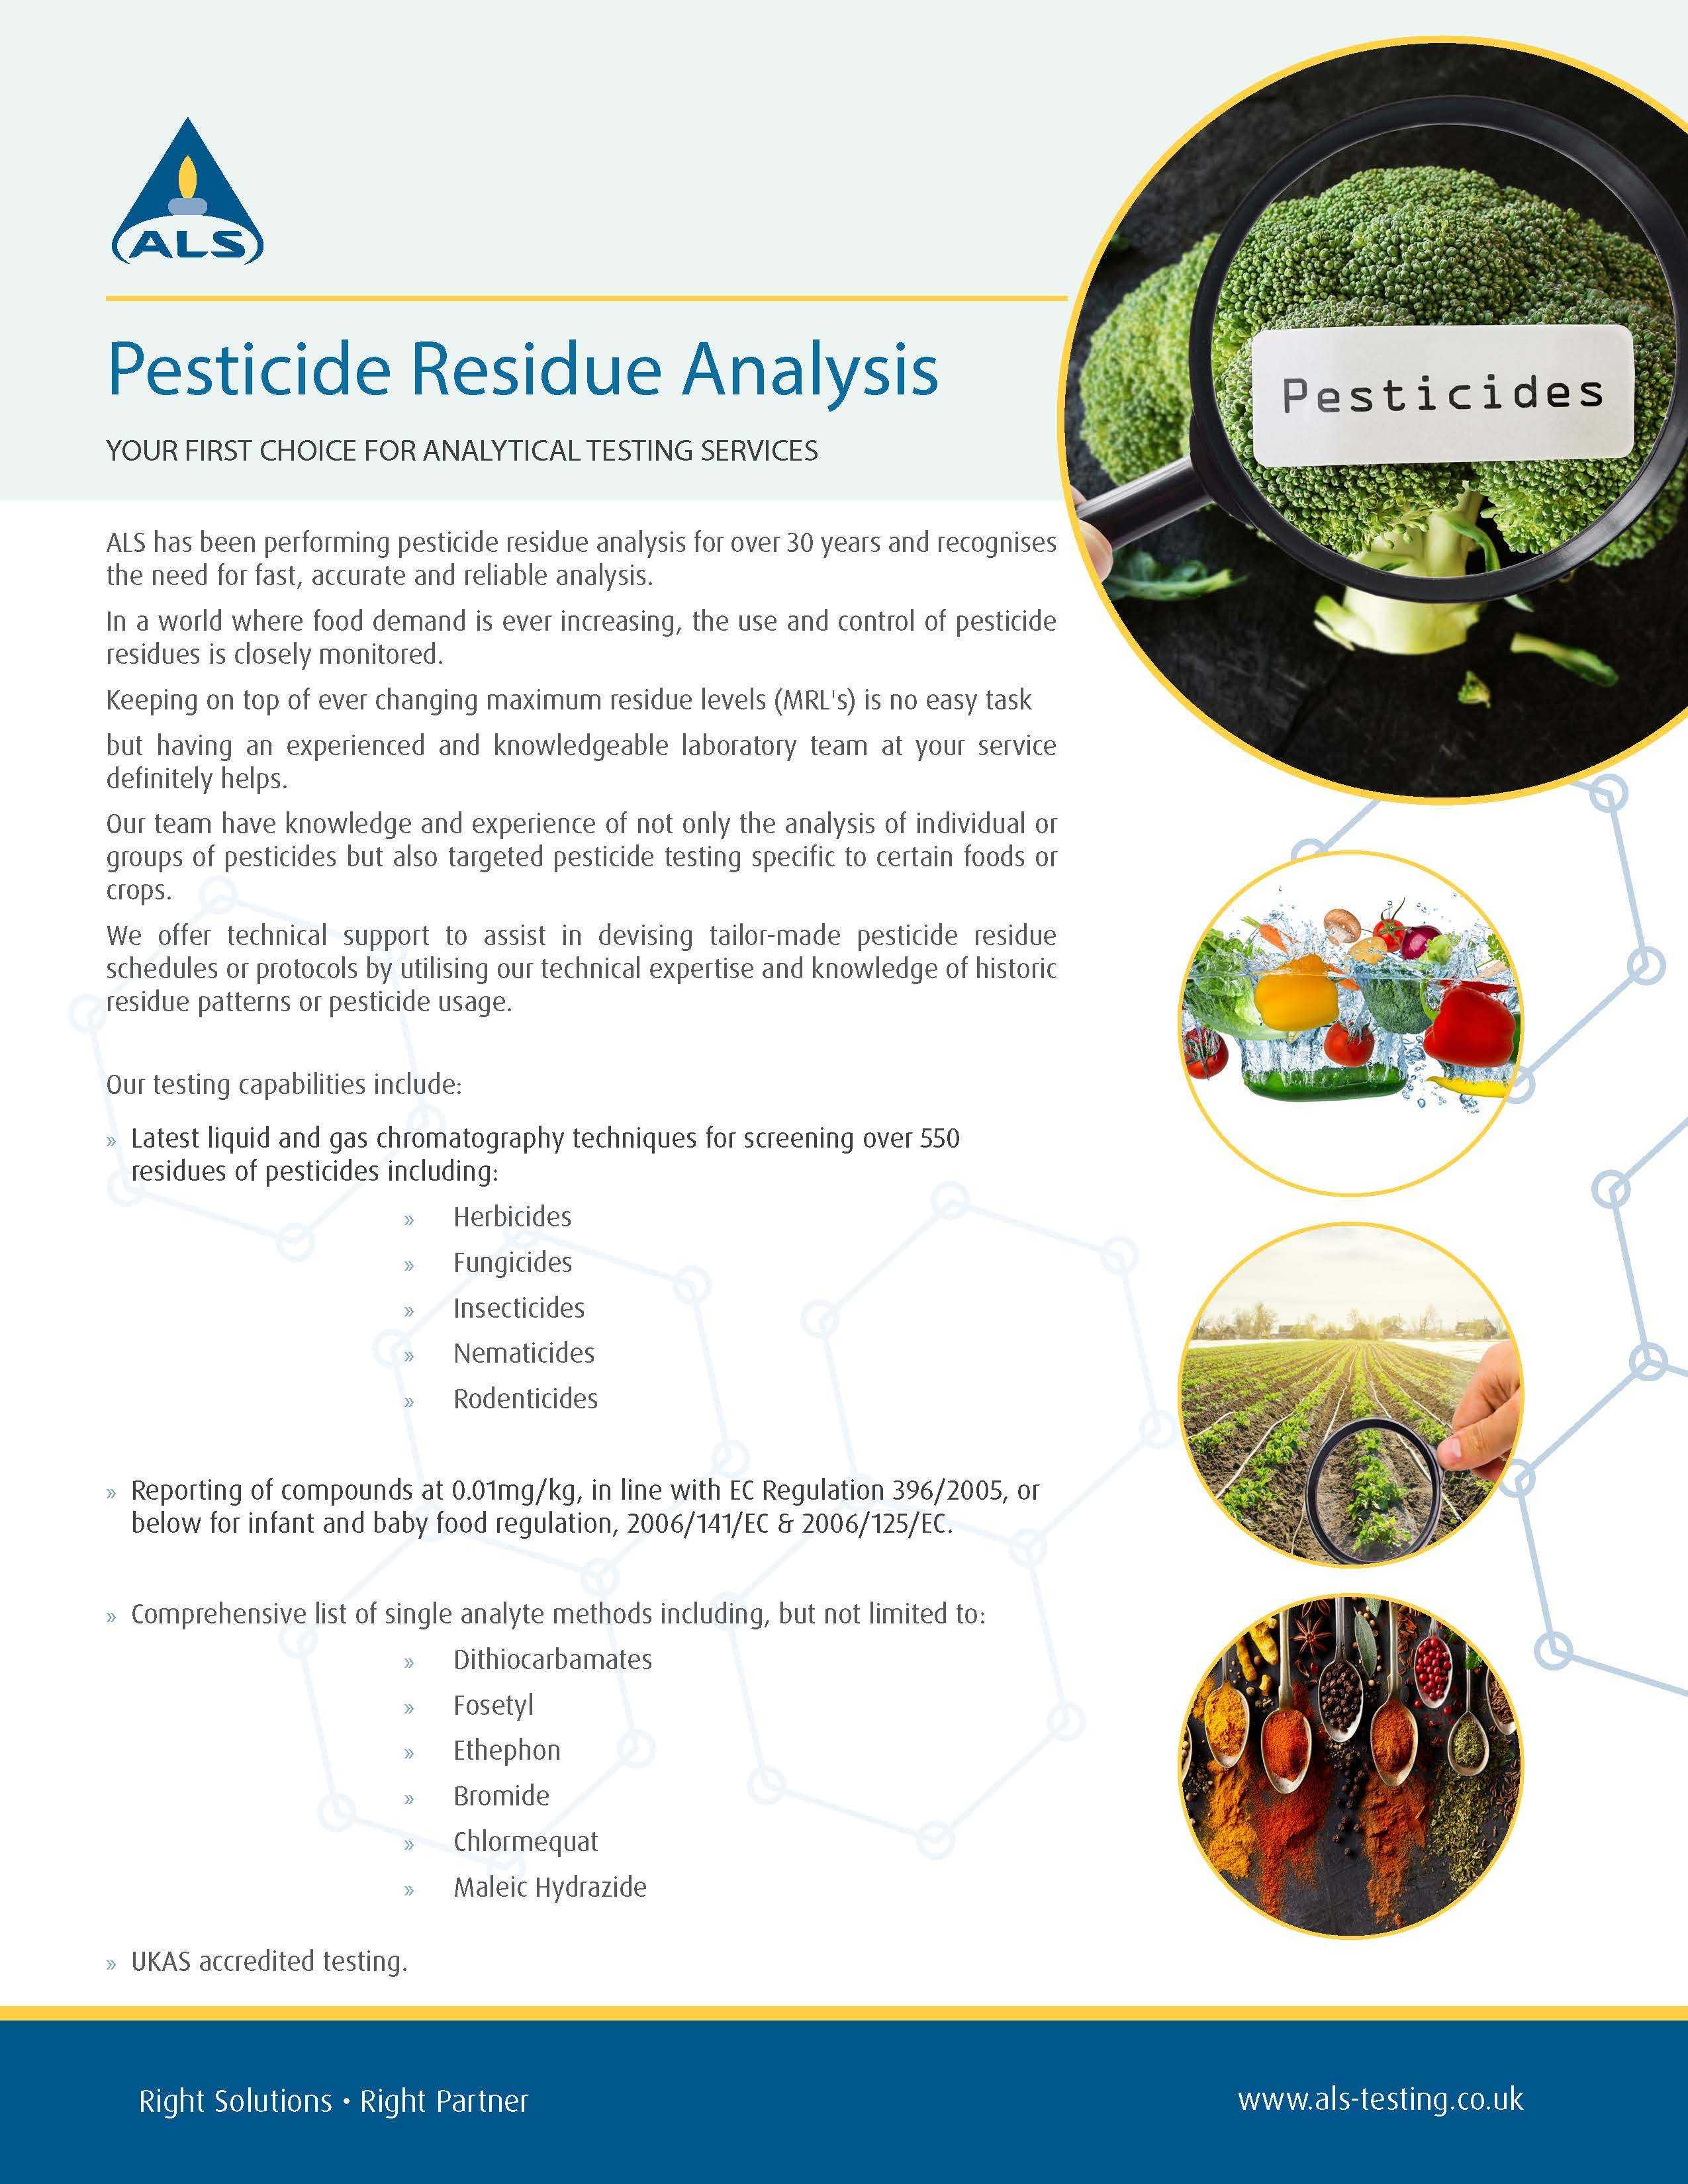 Pestcides